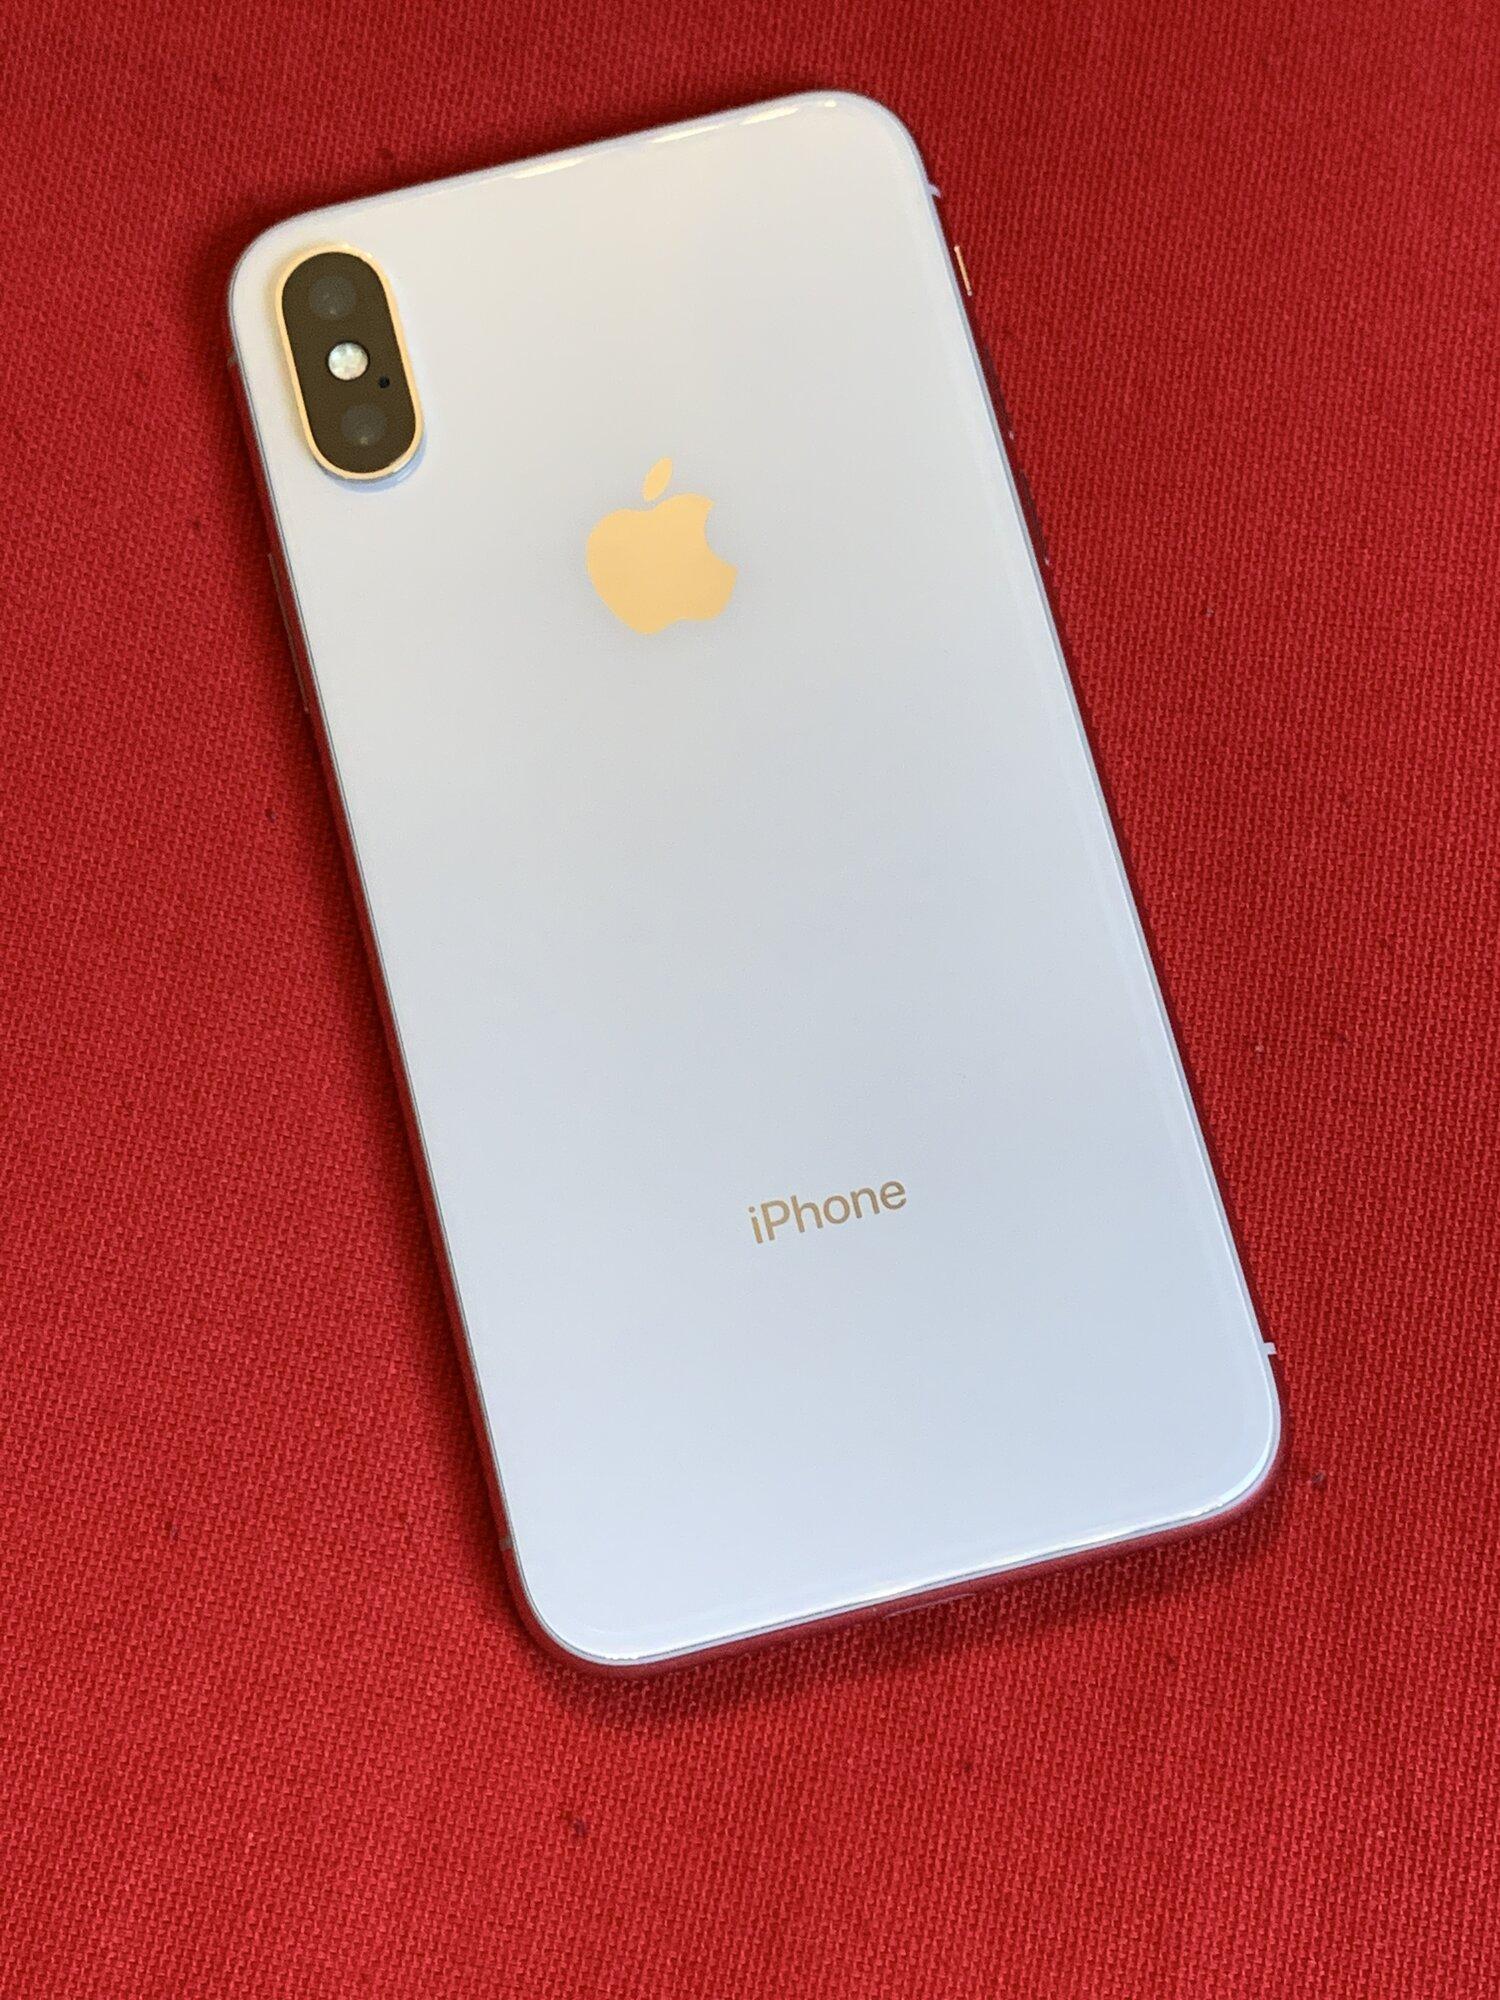 iPhone X (3).JPG